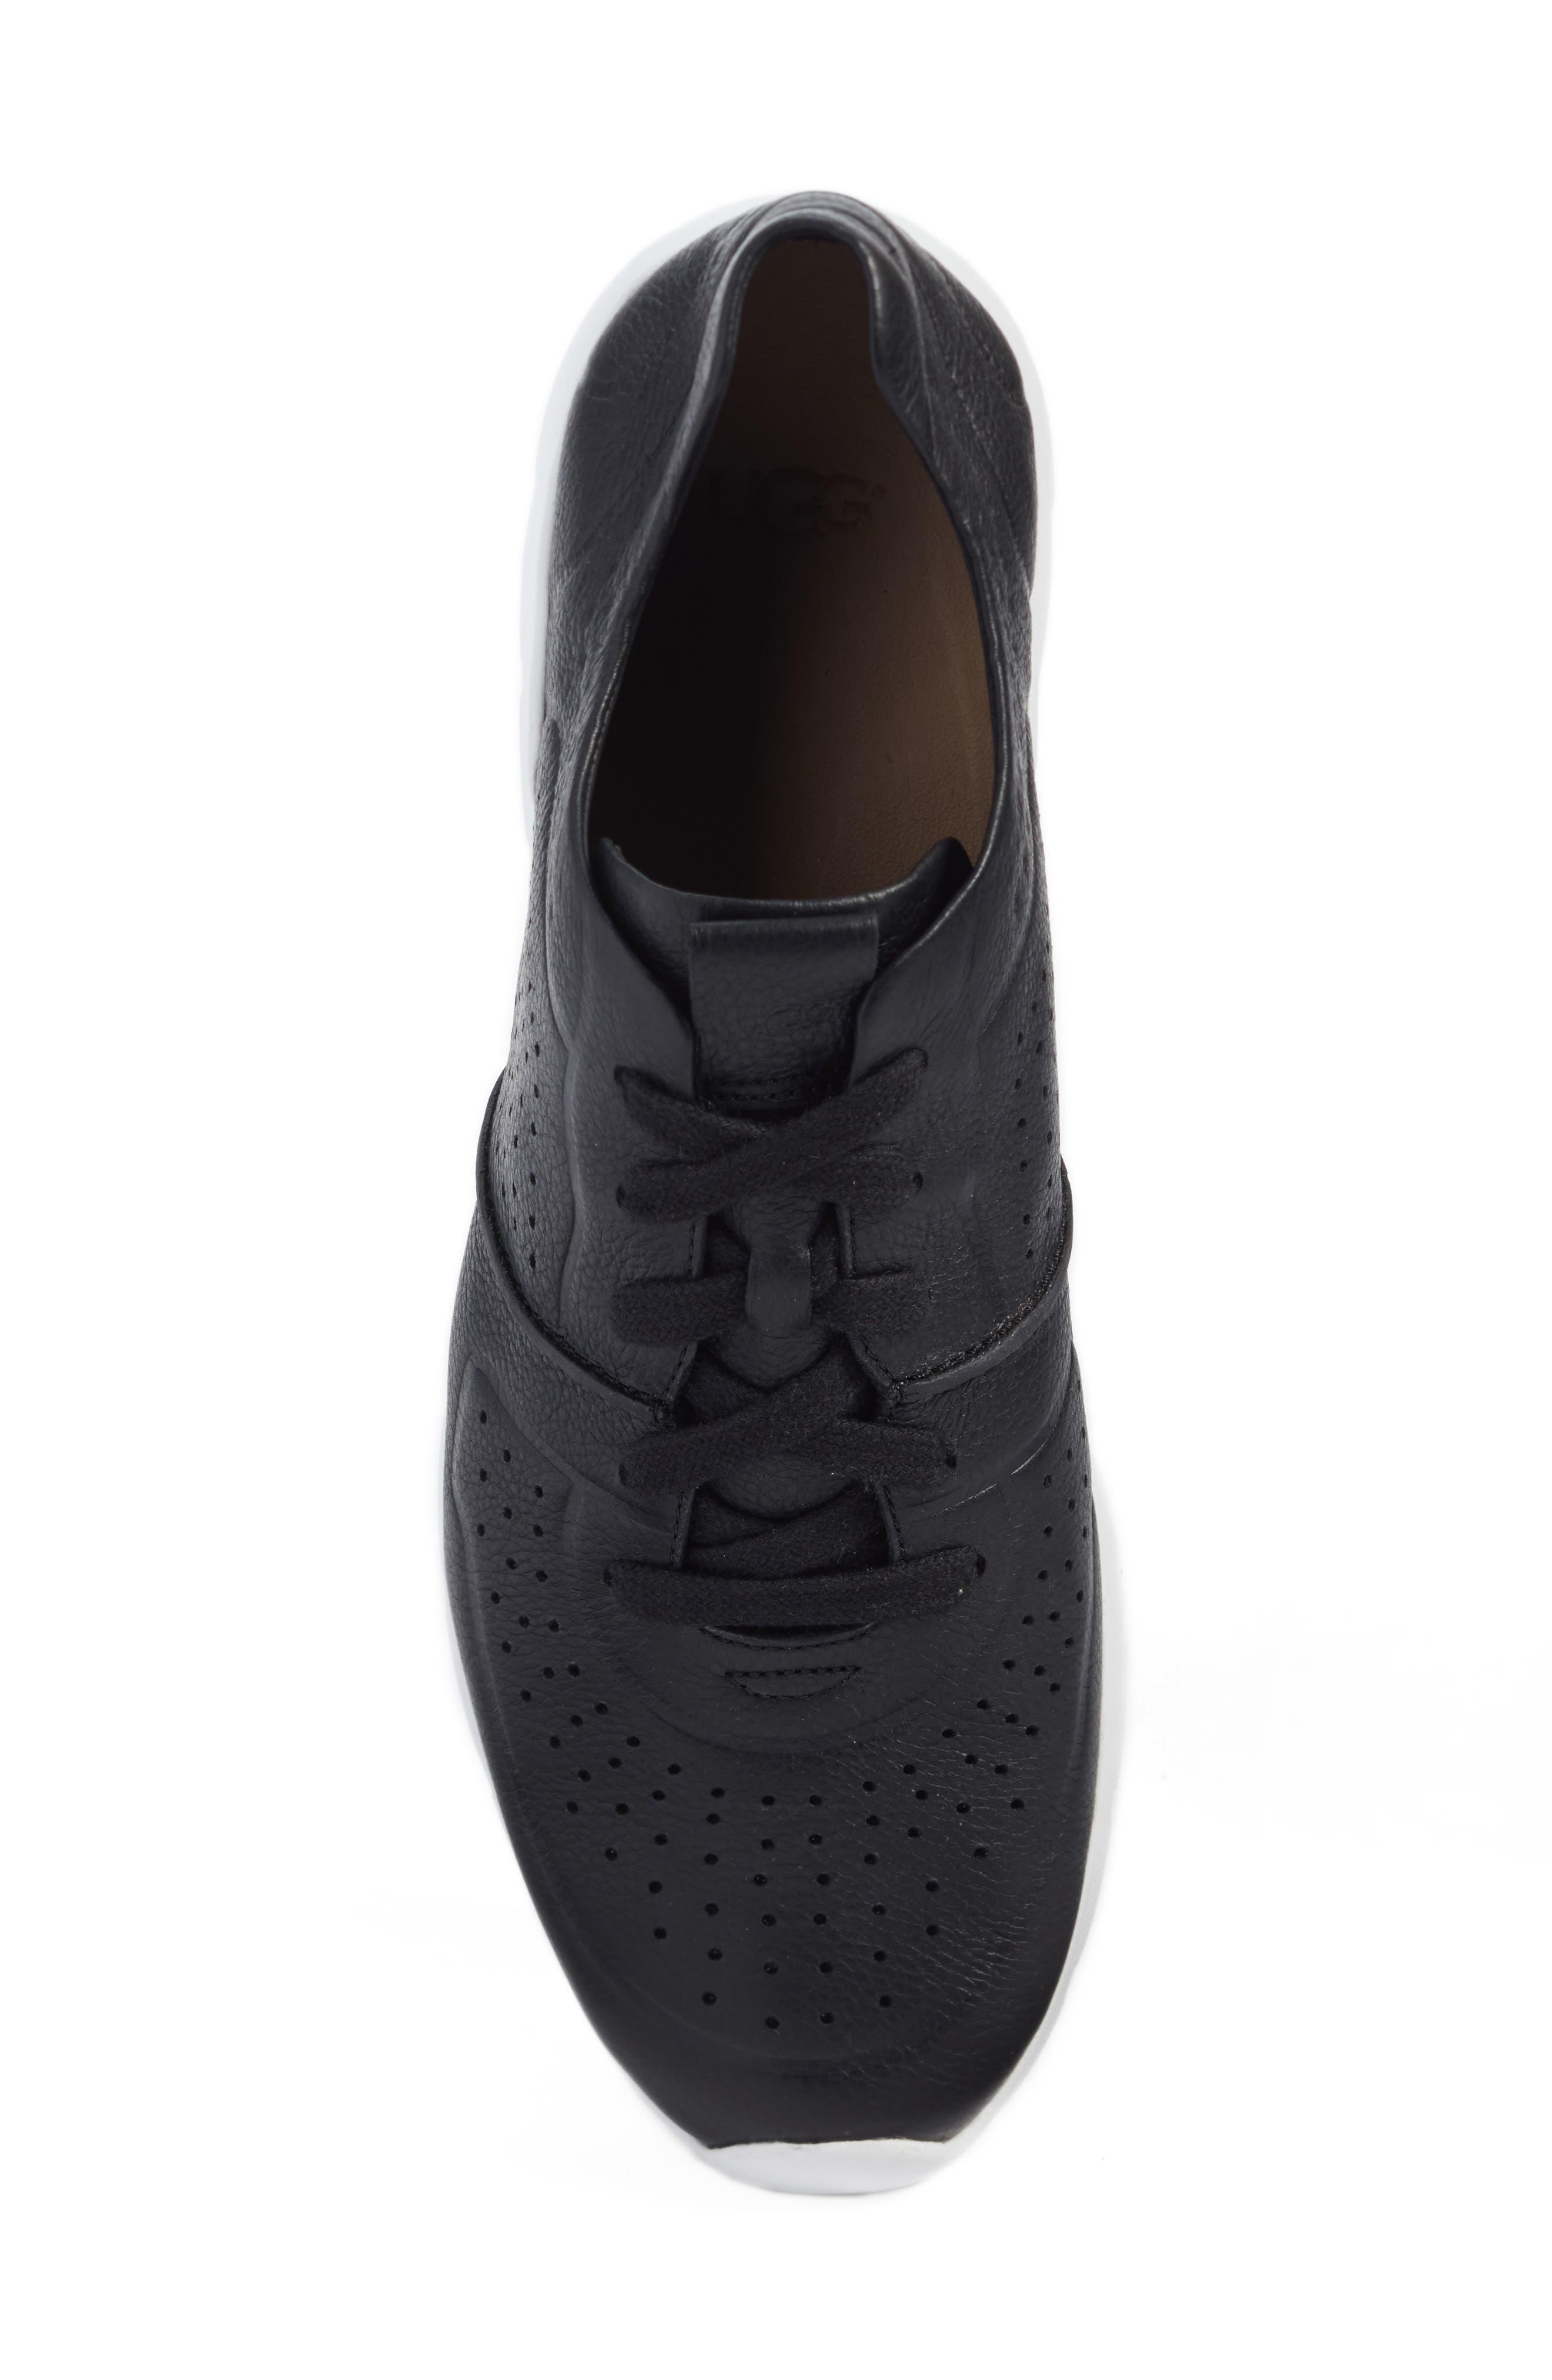 Tye Sneaker,                             Alternate thumbnail 5, color,                             001